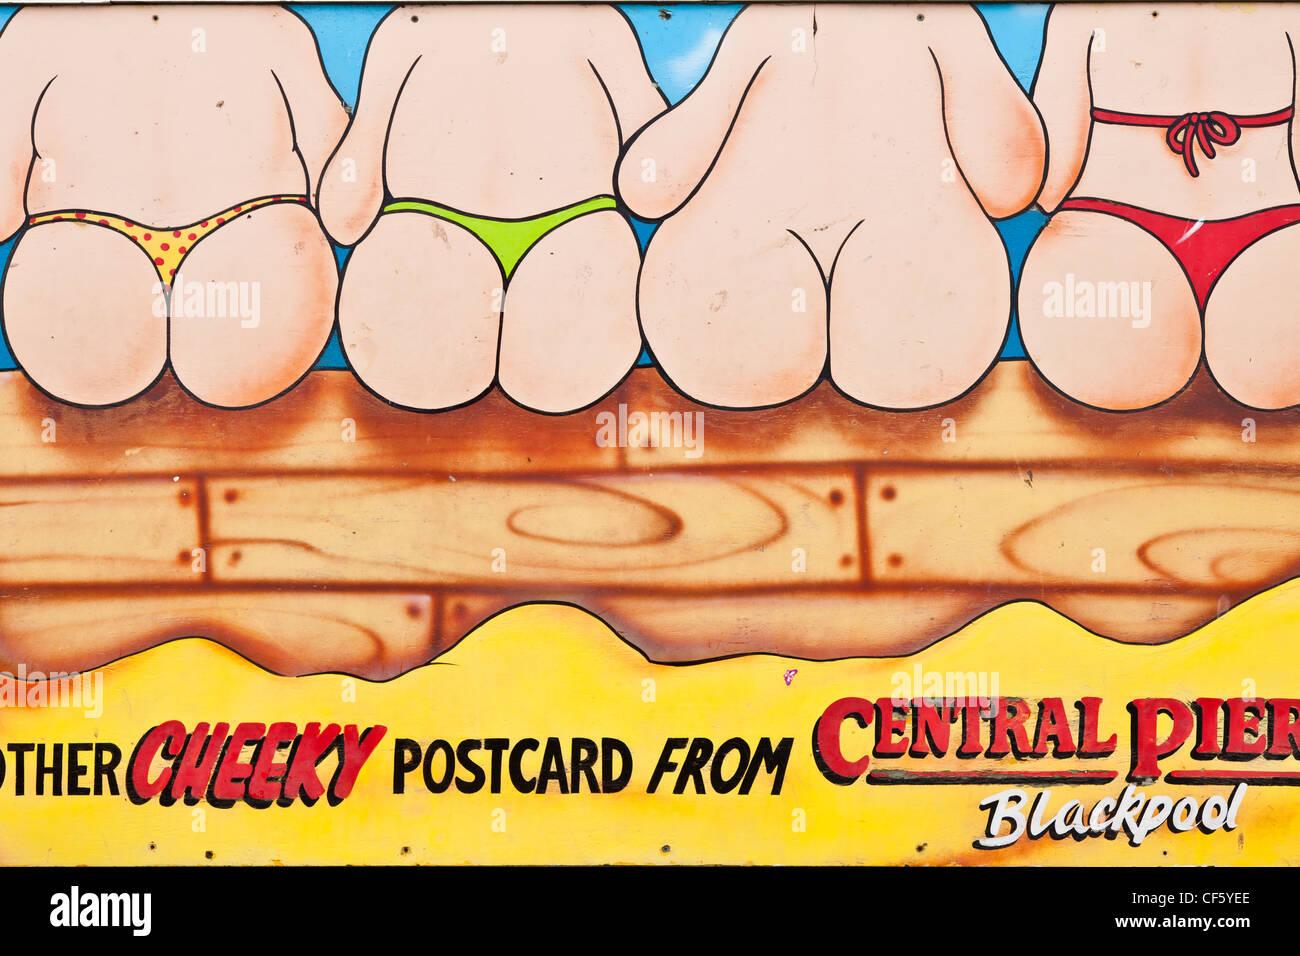 Blackpool Central Pier impertinente postal firmar. Imagen De Stock